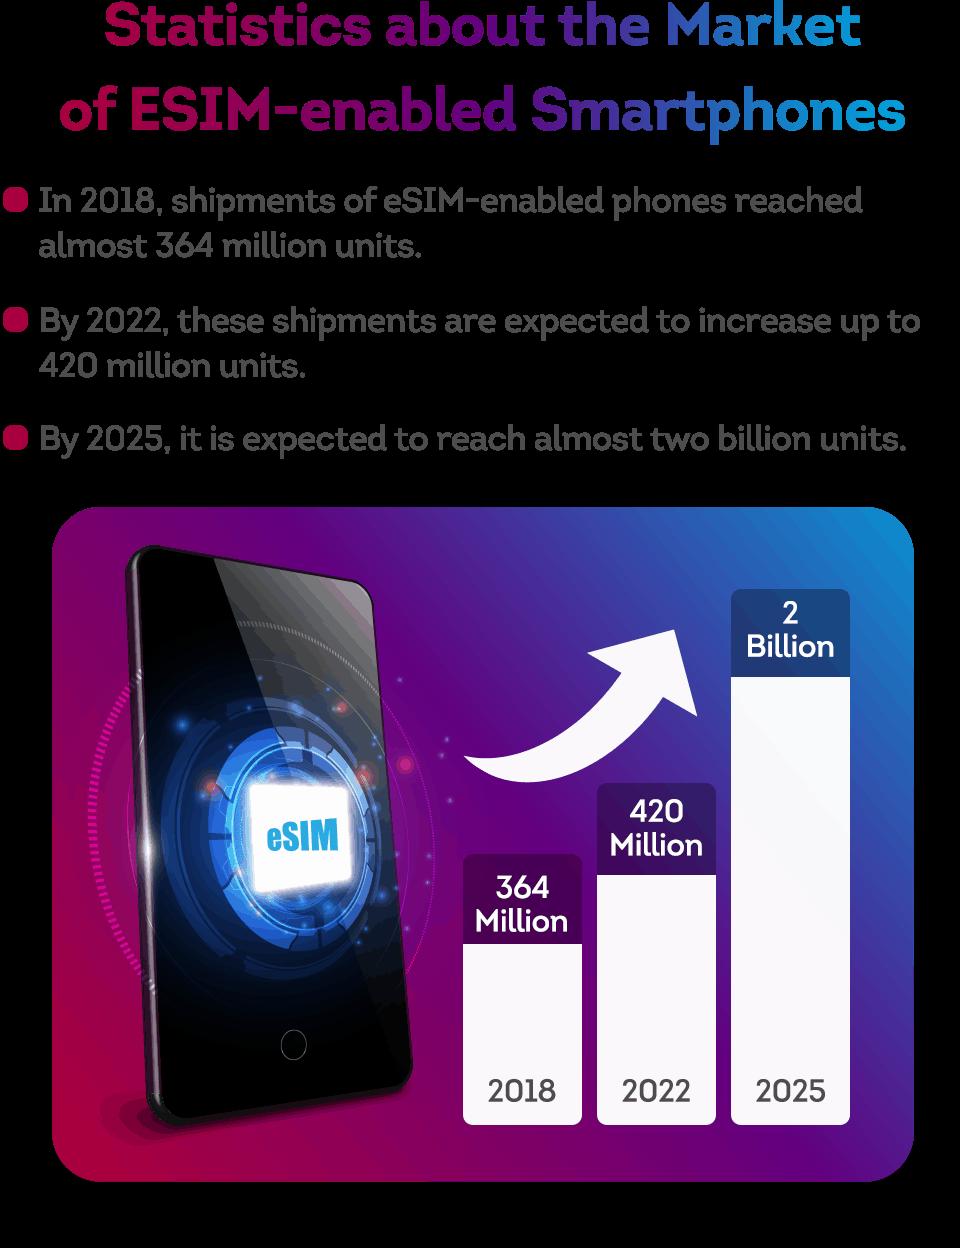 statistics about the eSIM market